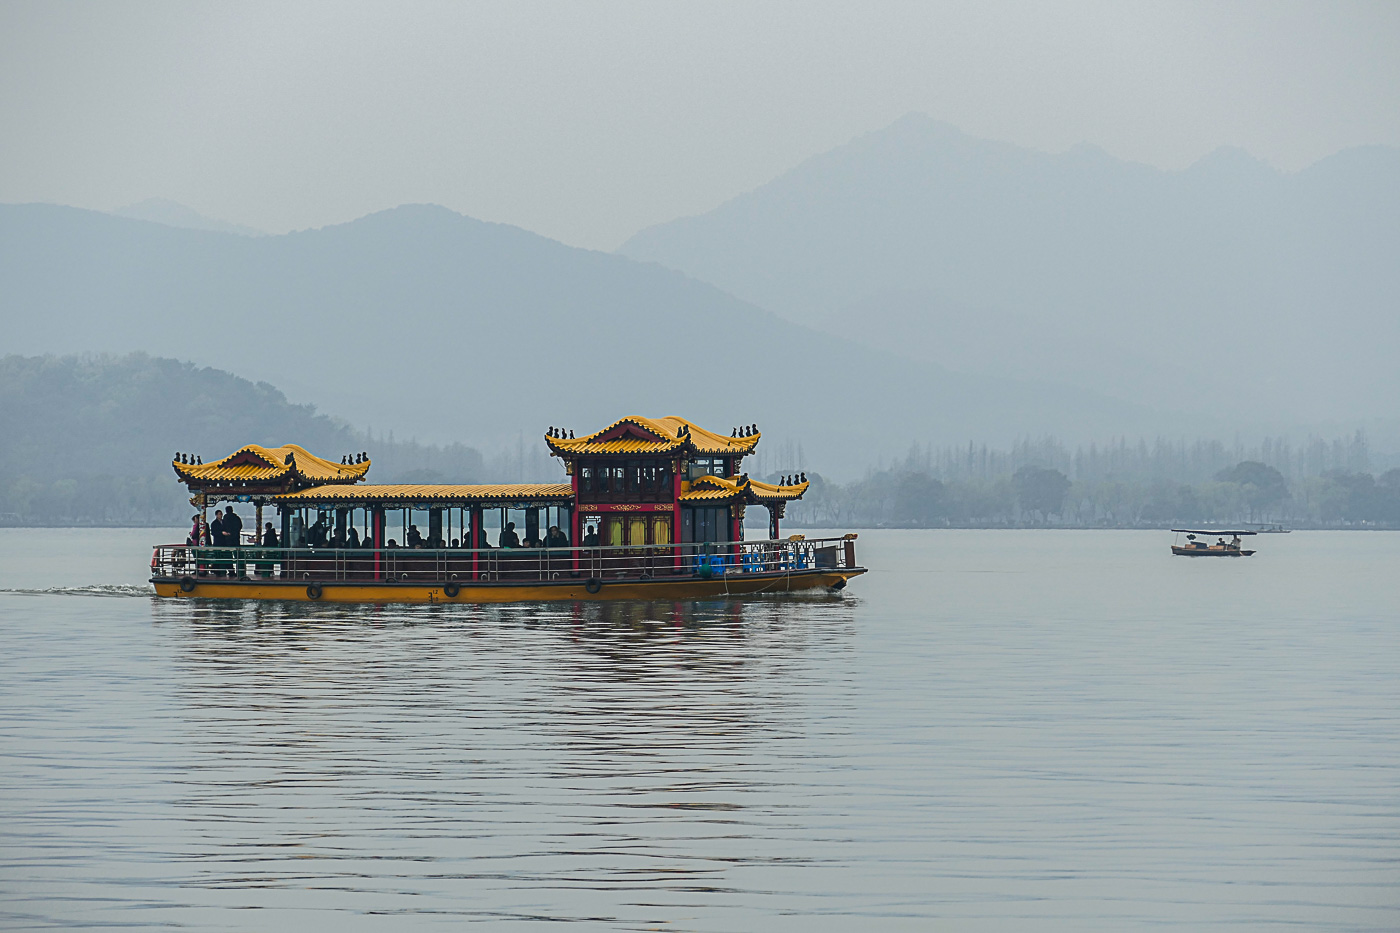 Ornate pagoda boat